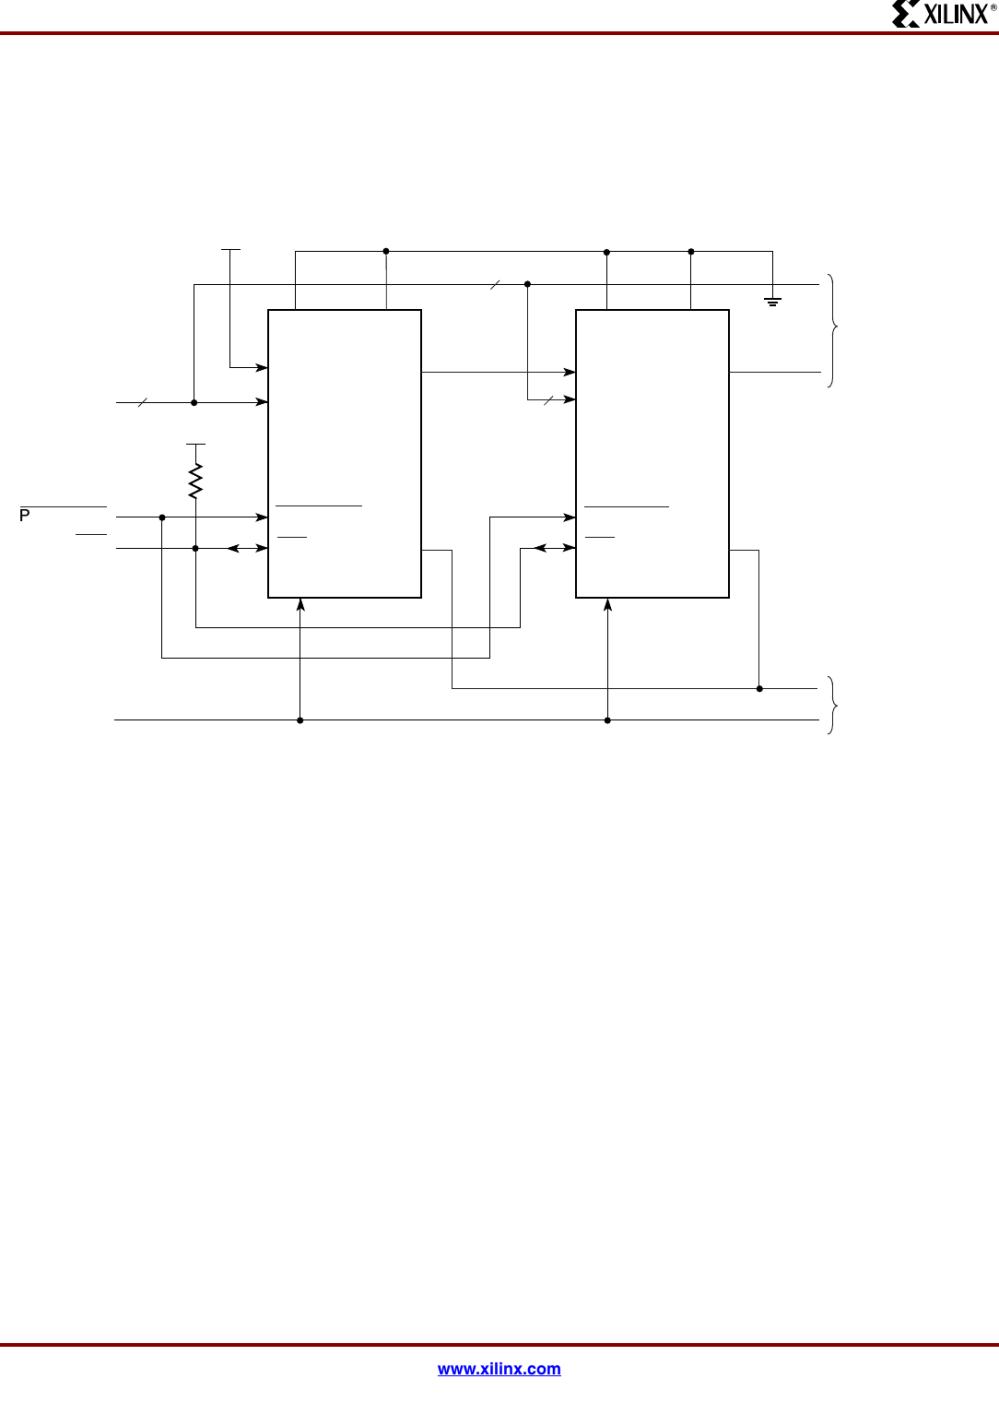 medium resolution of spartan and spartan xl fpga families data sheet